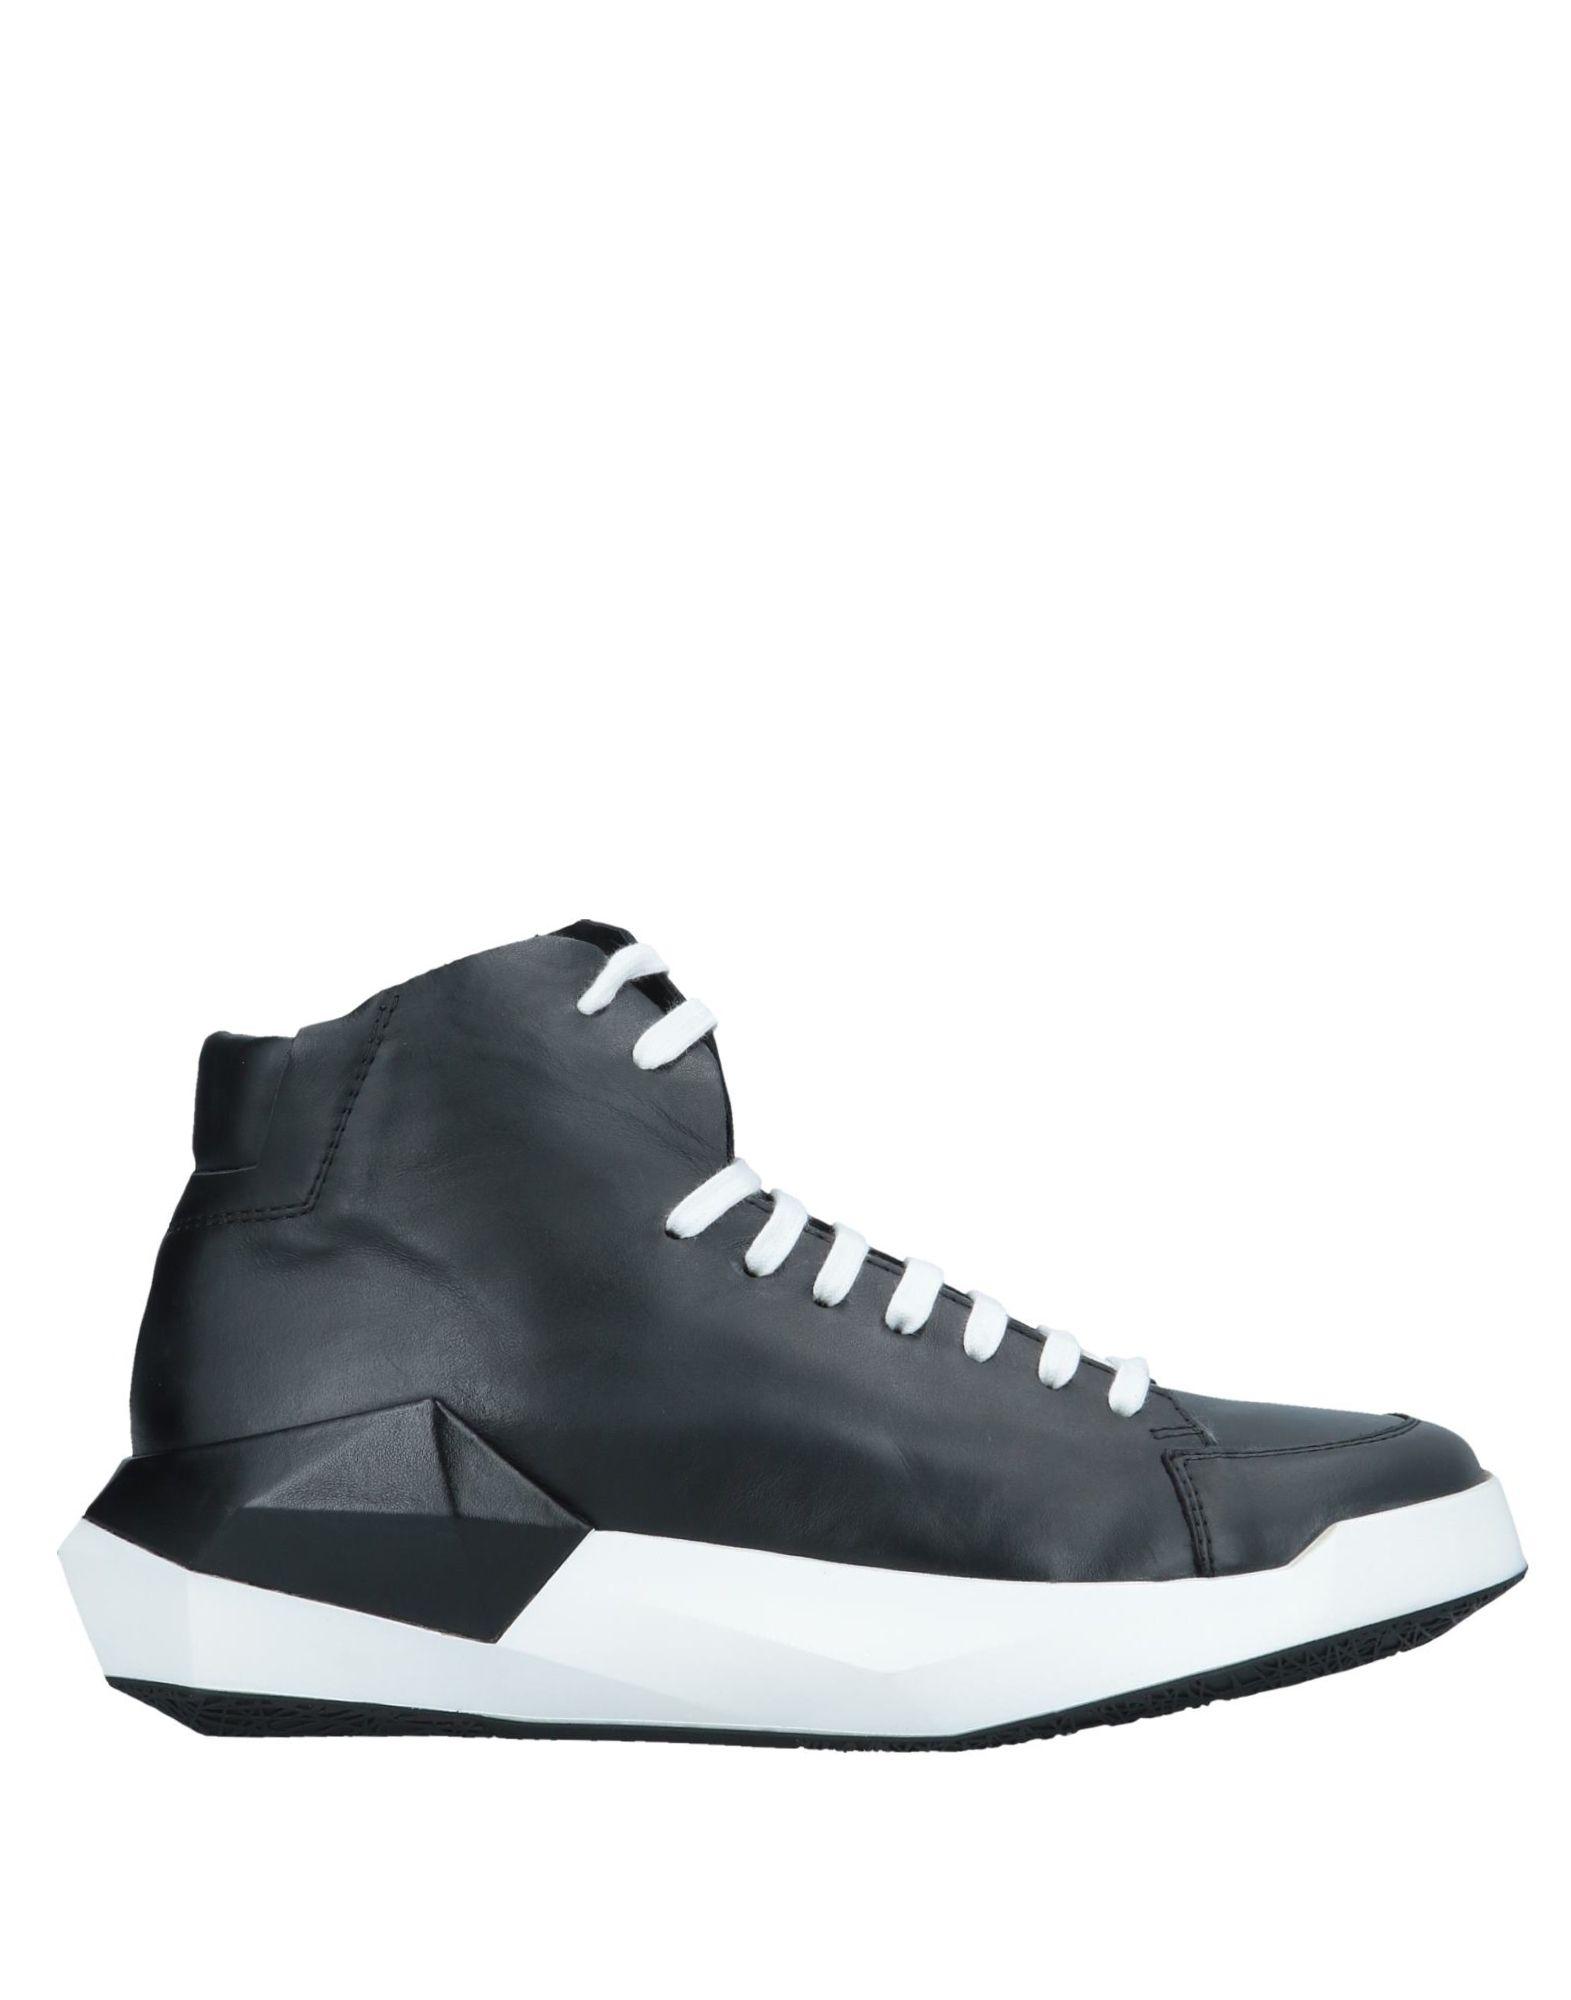 Cinzia on Araia Sneakers - Men Cinzia Araia Sneakers online on Cinzia  Australia - 11560614MP e57a48